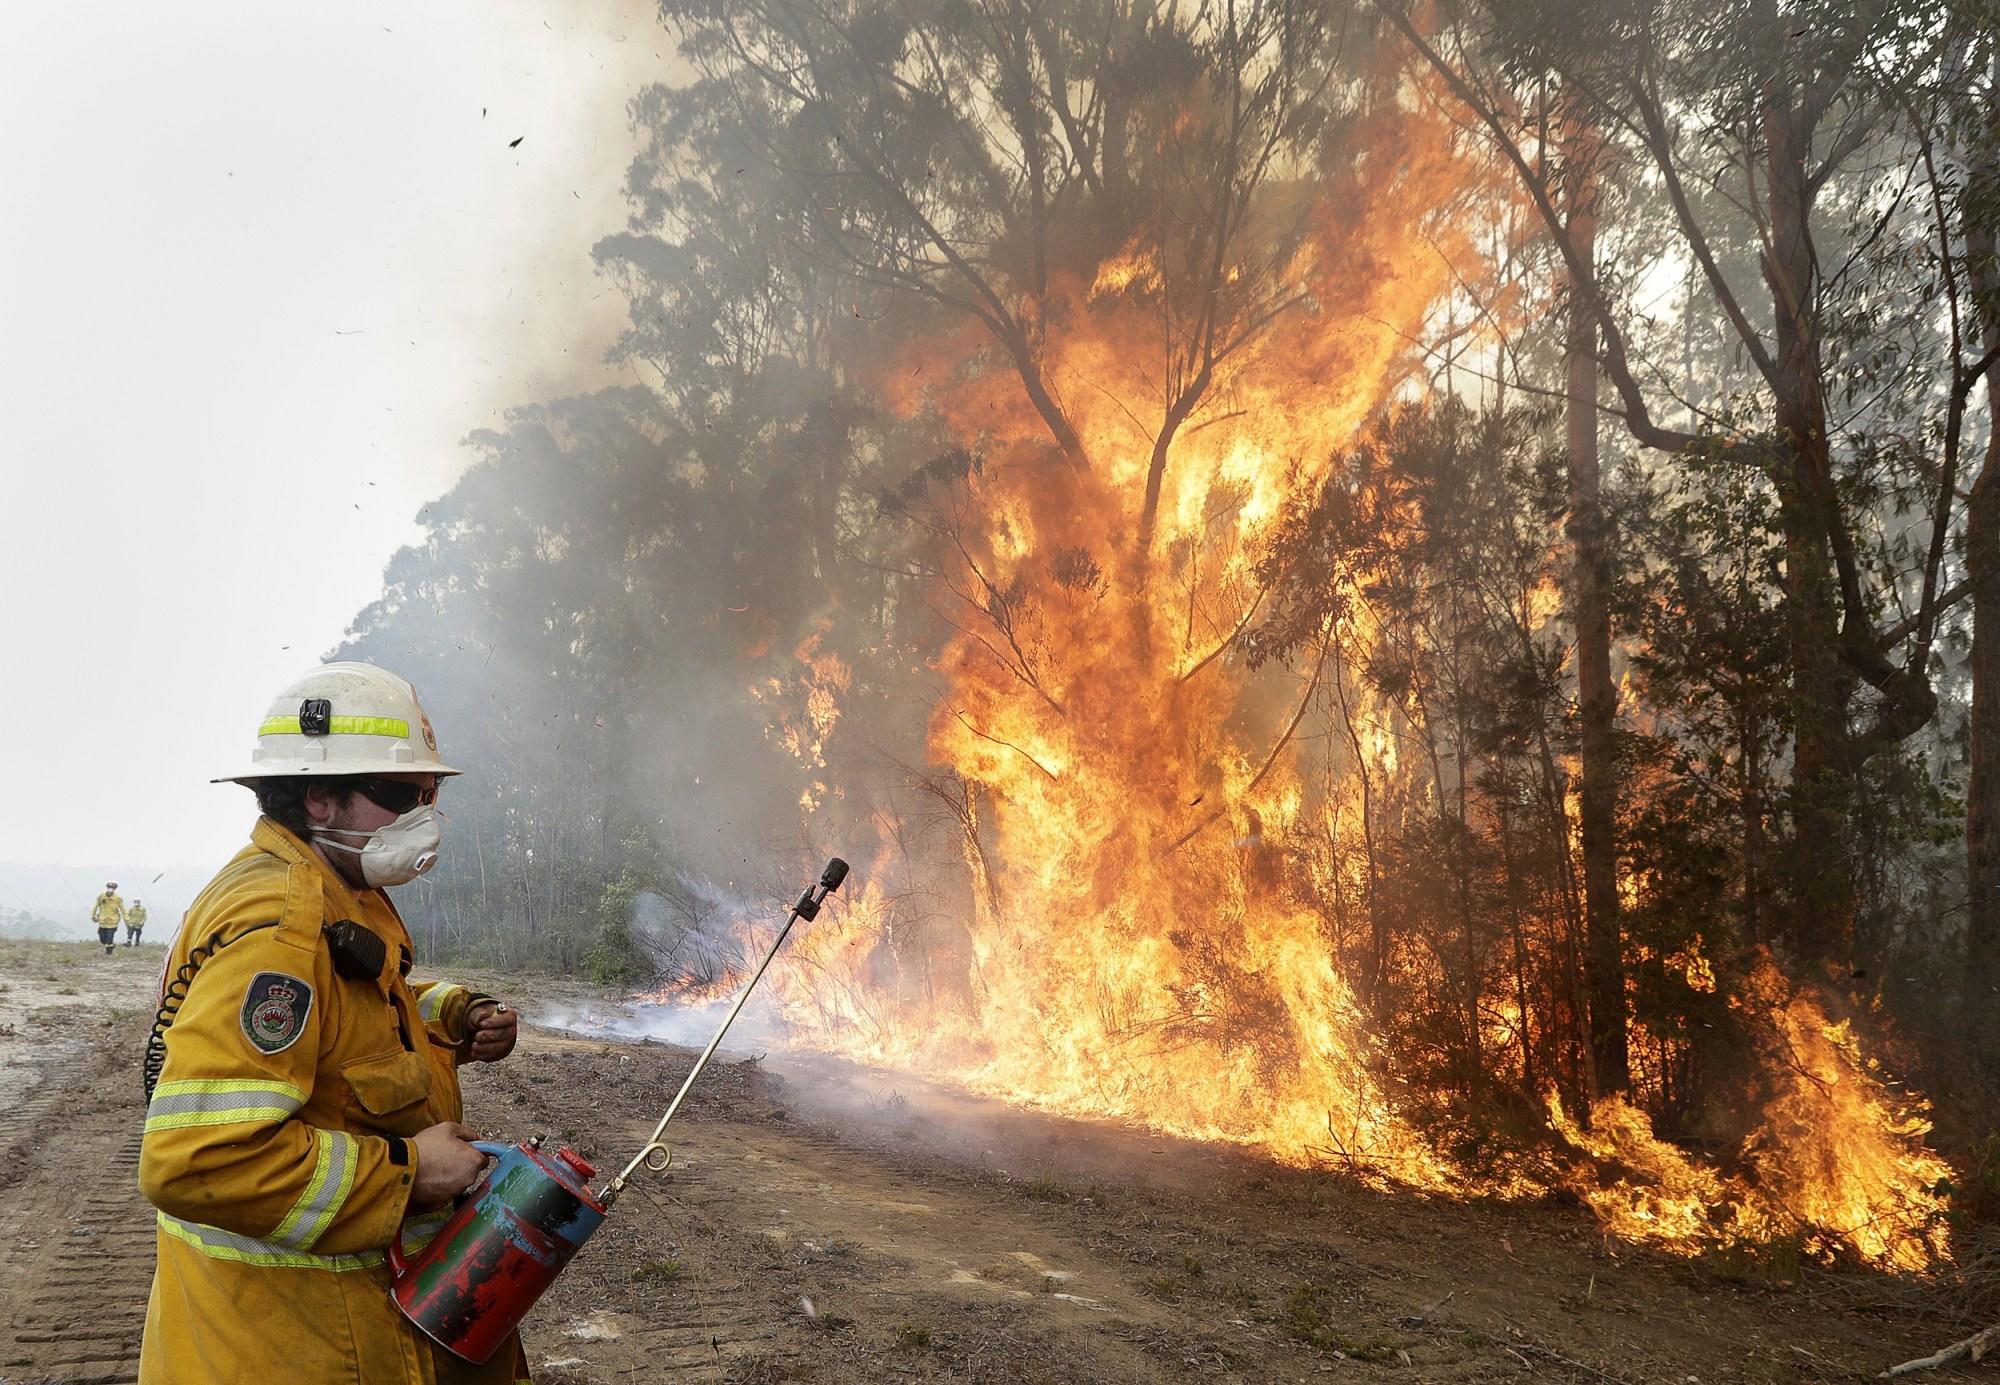 Australia's wildfire crisis faces a new foe: Misinformation